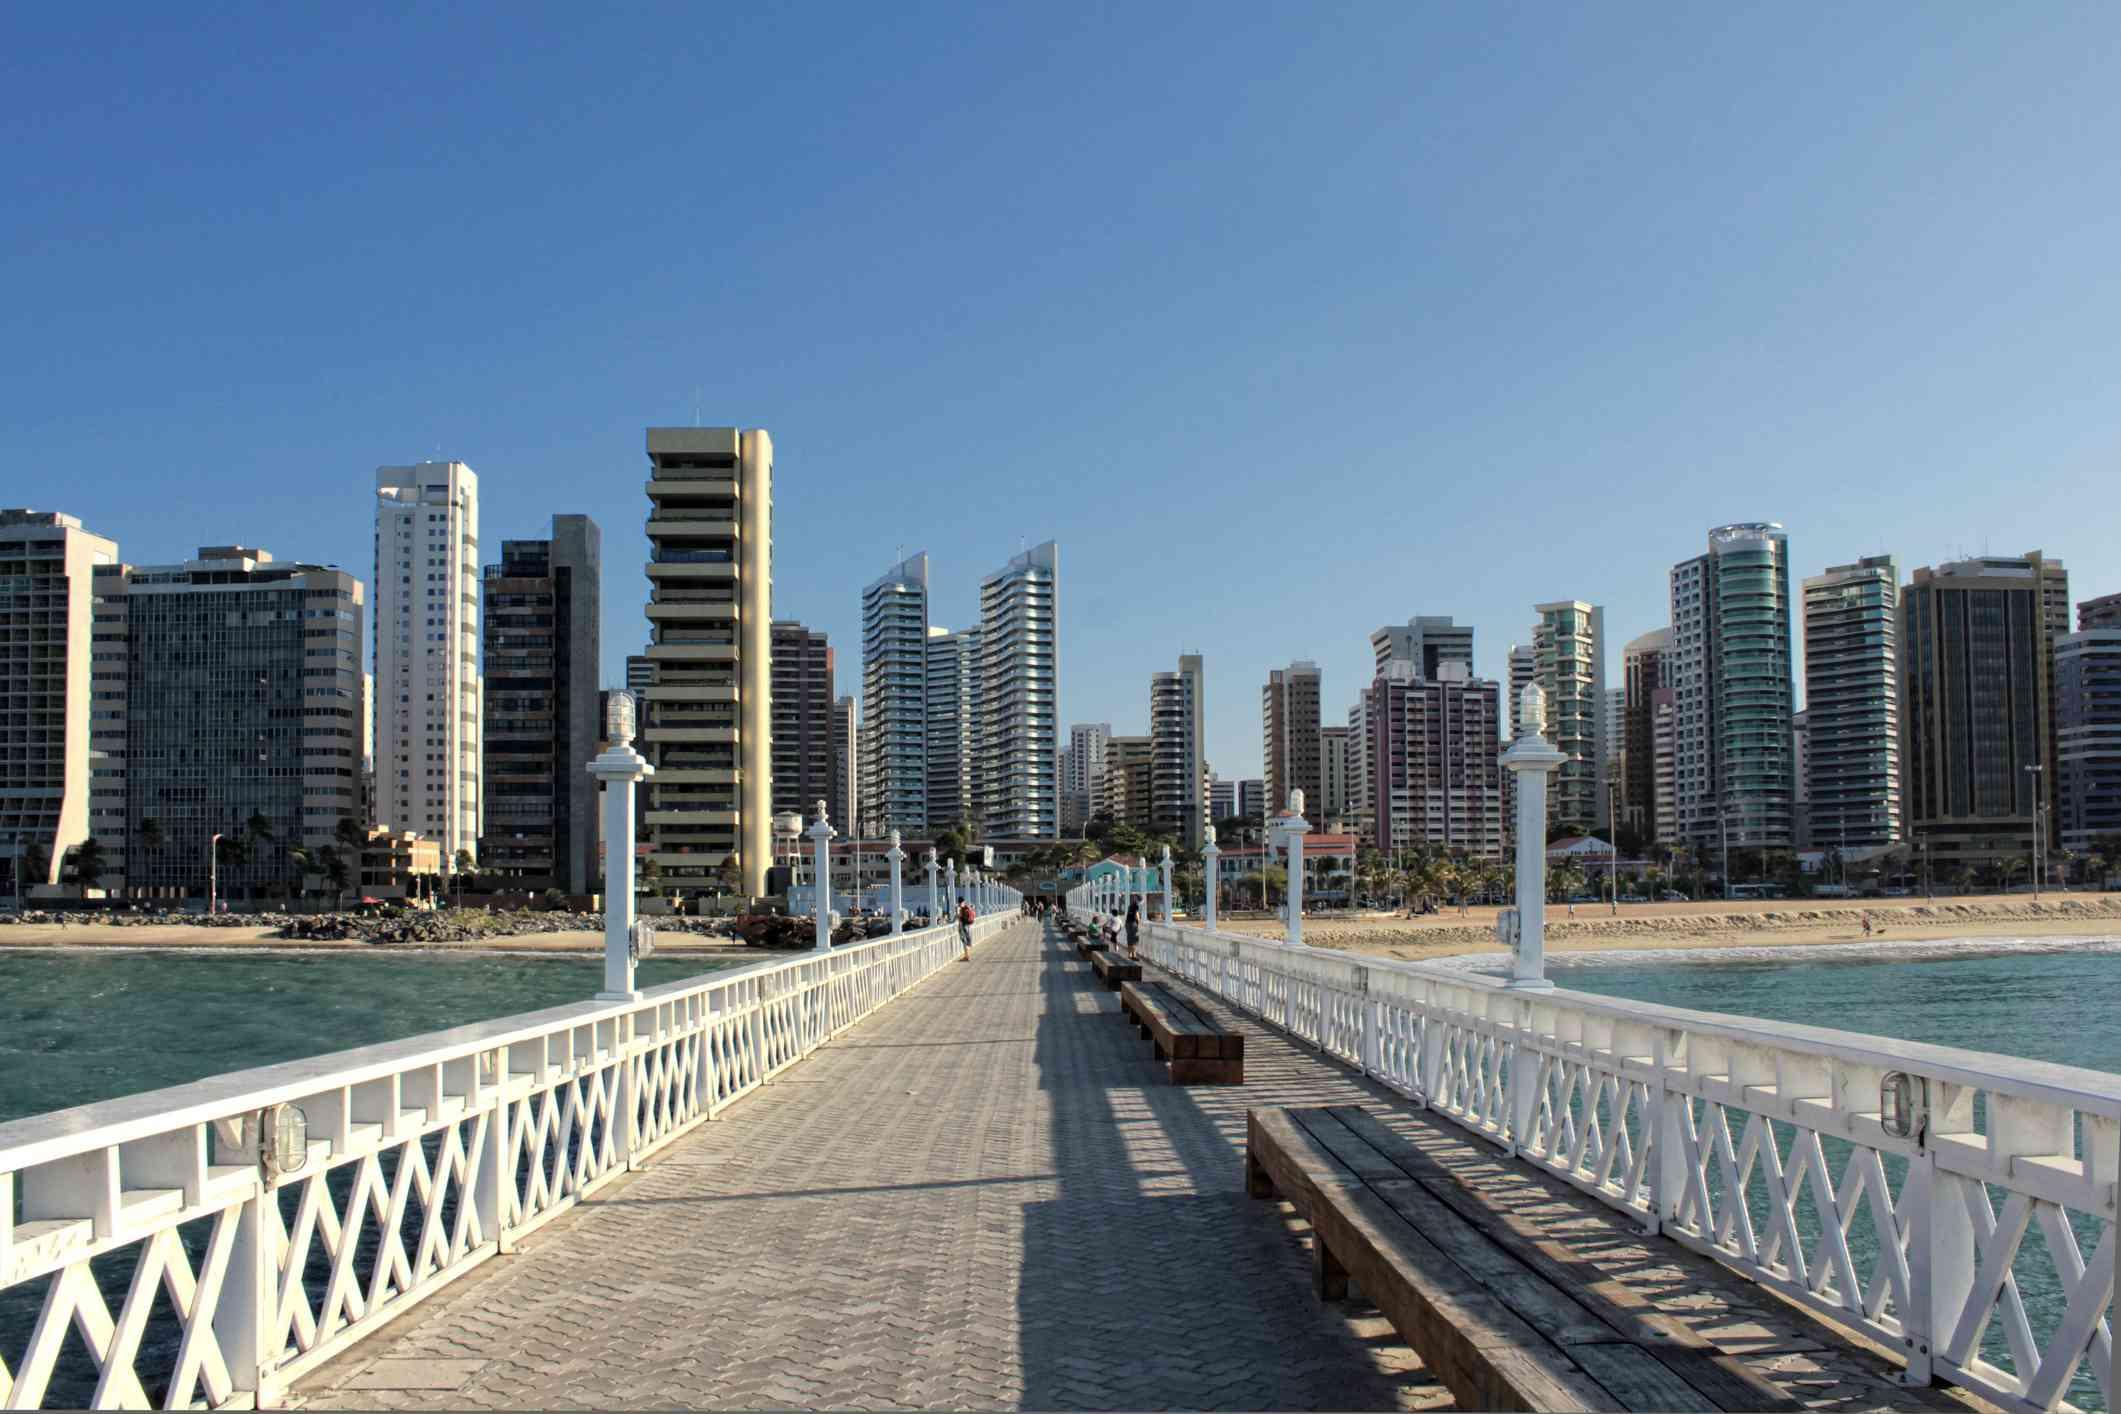 Pier of Iracema beach with skyline in background, Fortaleza, Ceará, Brazil.